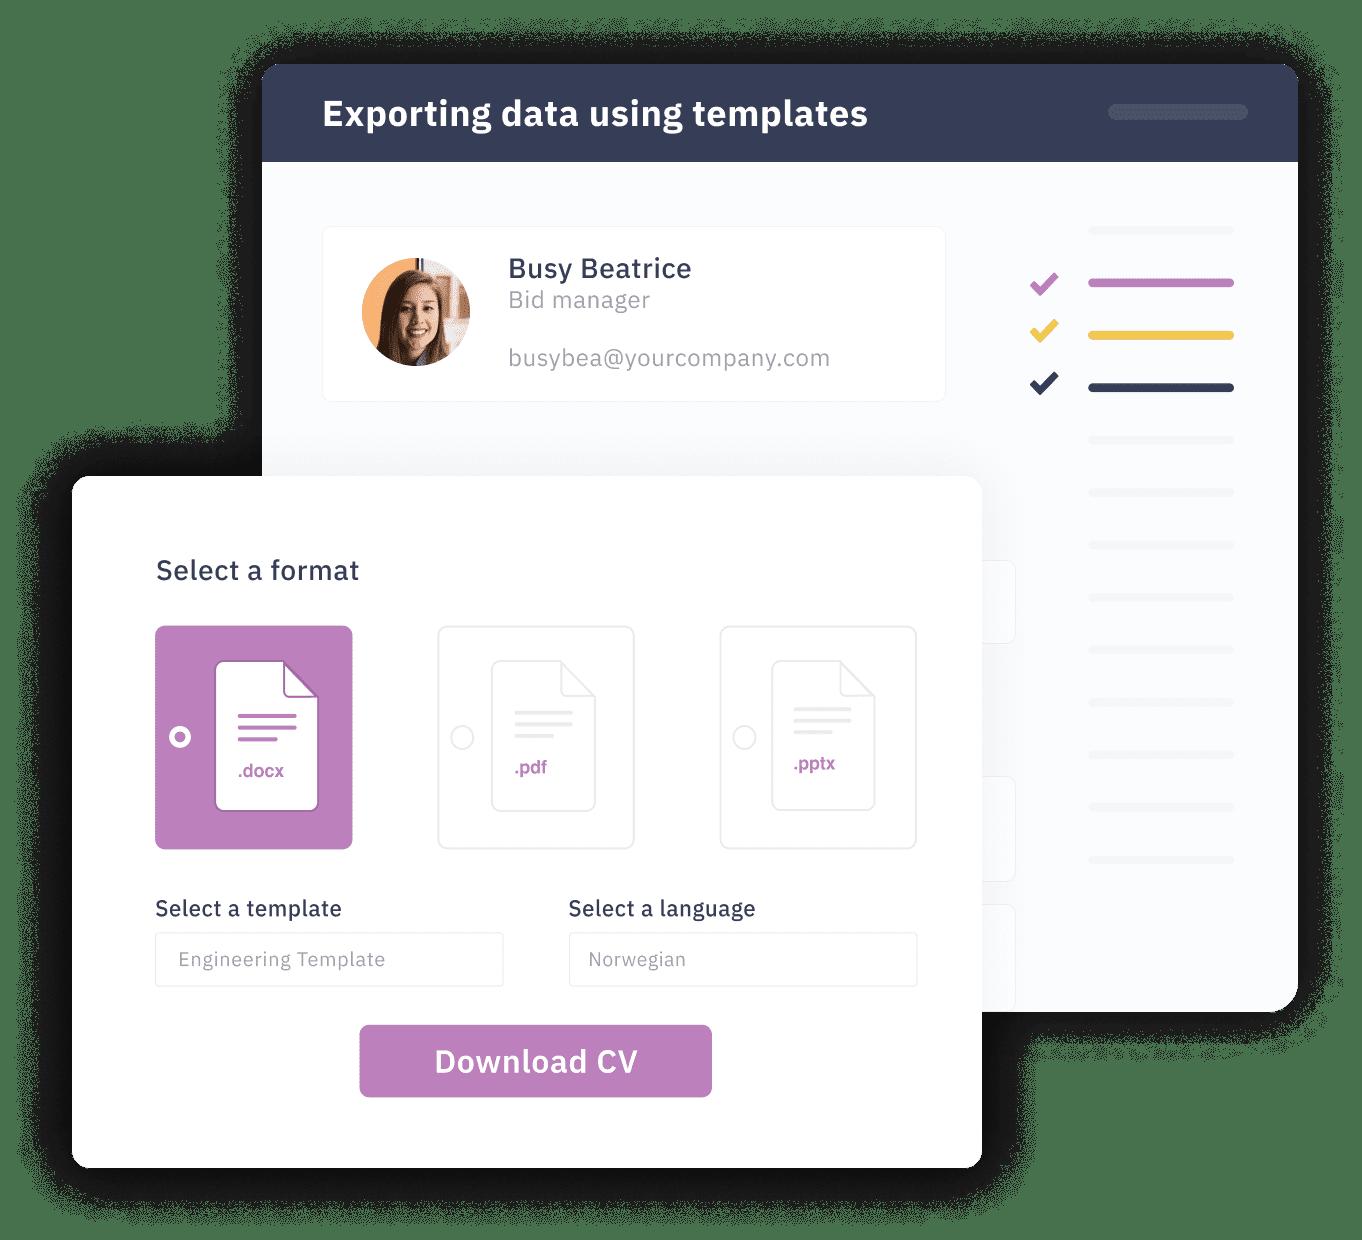 Export data using custom templates